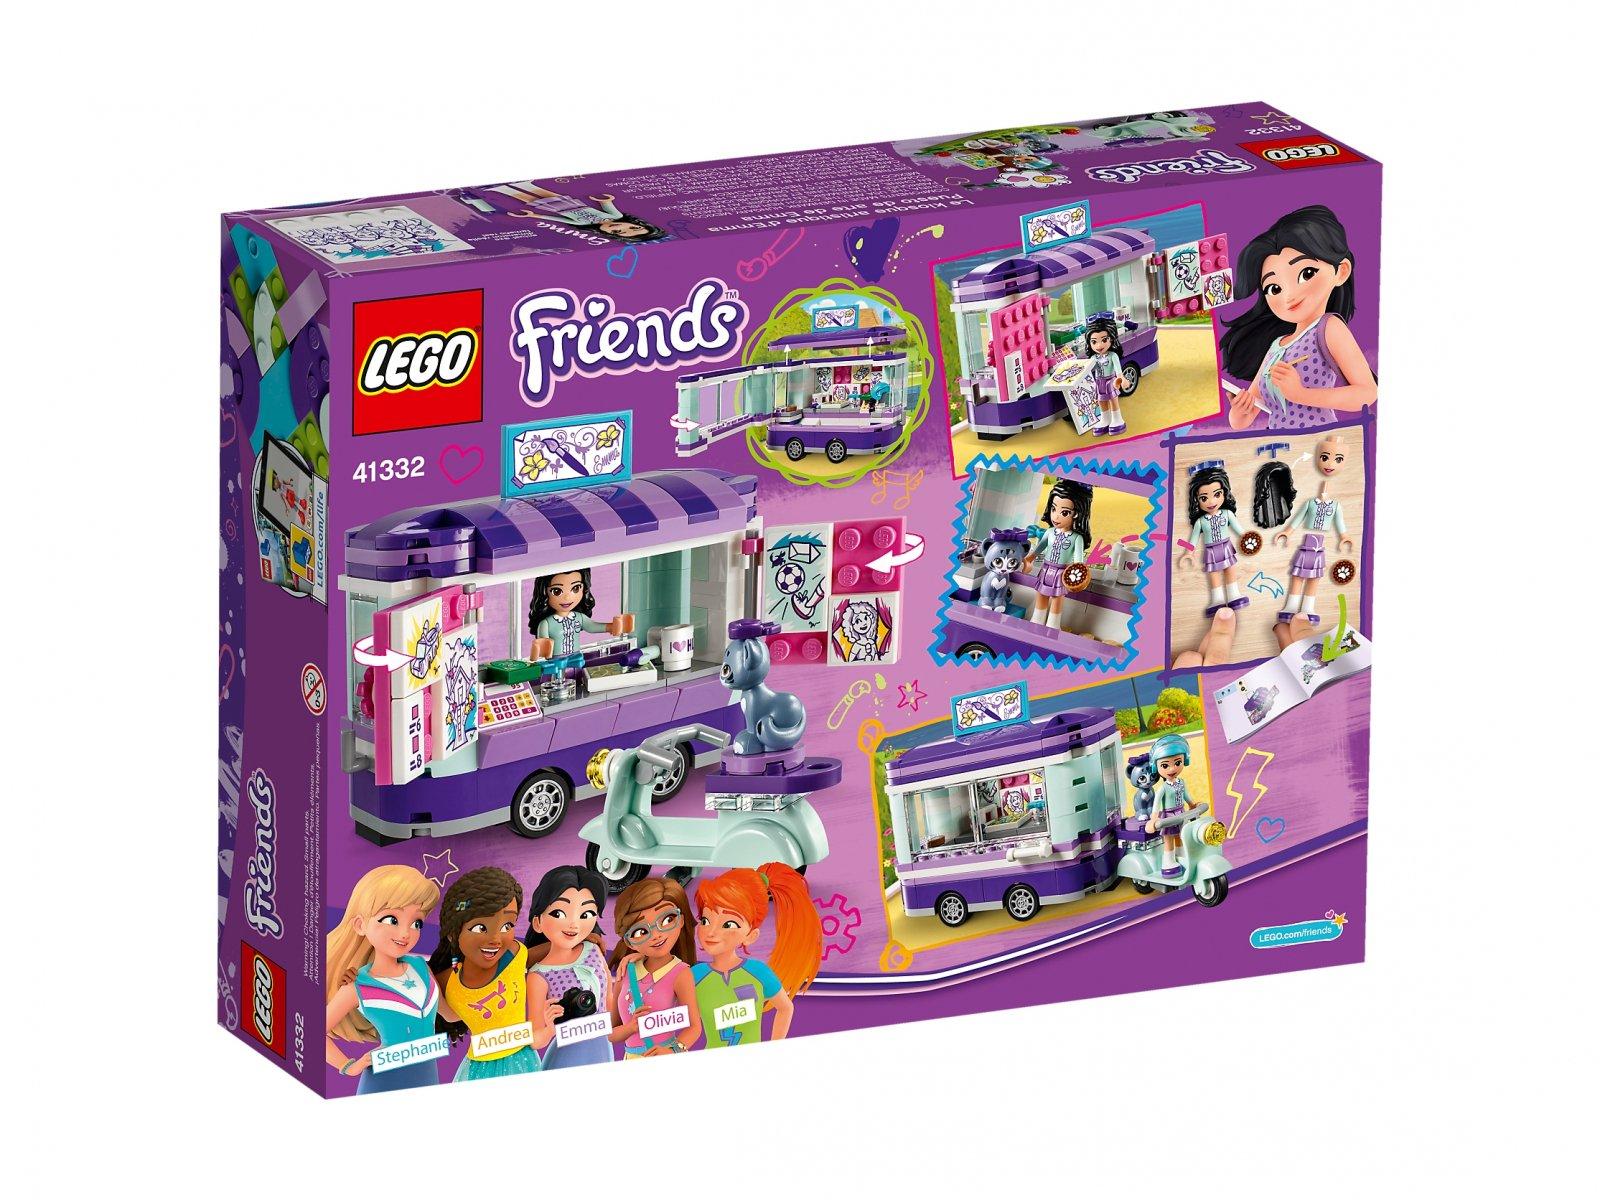 LEGO Friends 41332 Stoisko z rysunkami Emmy